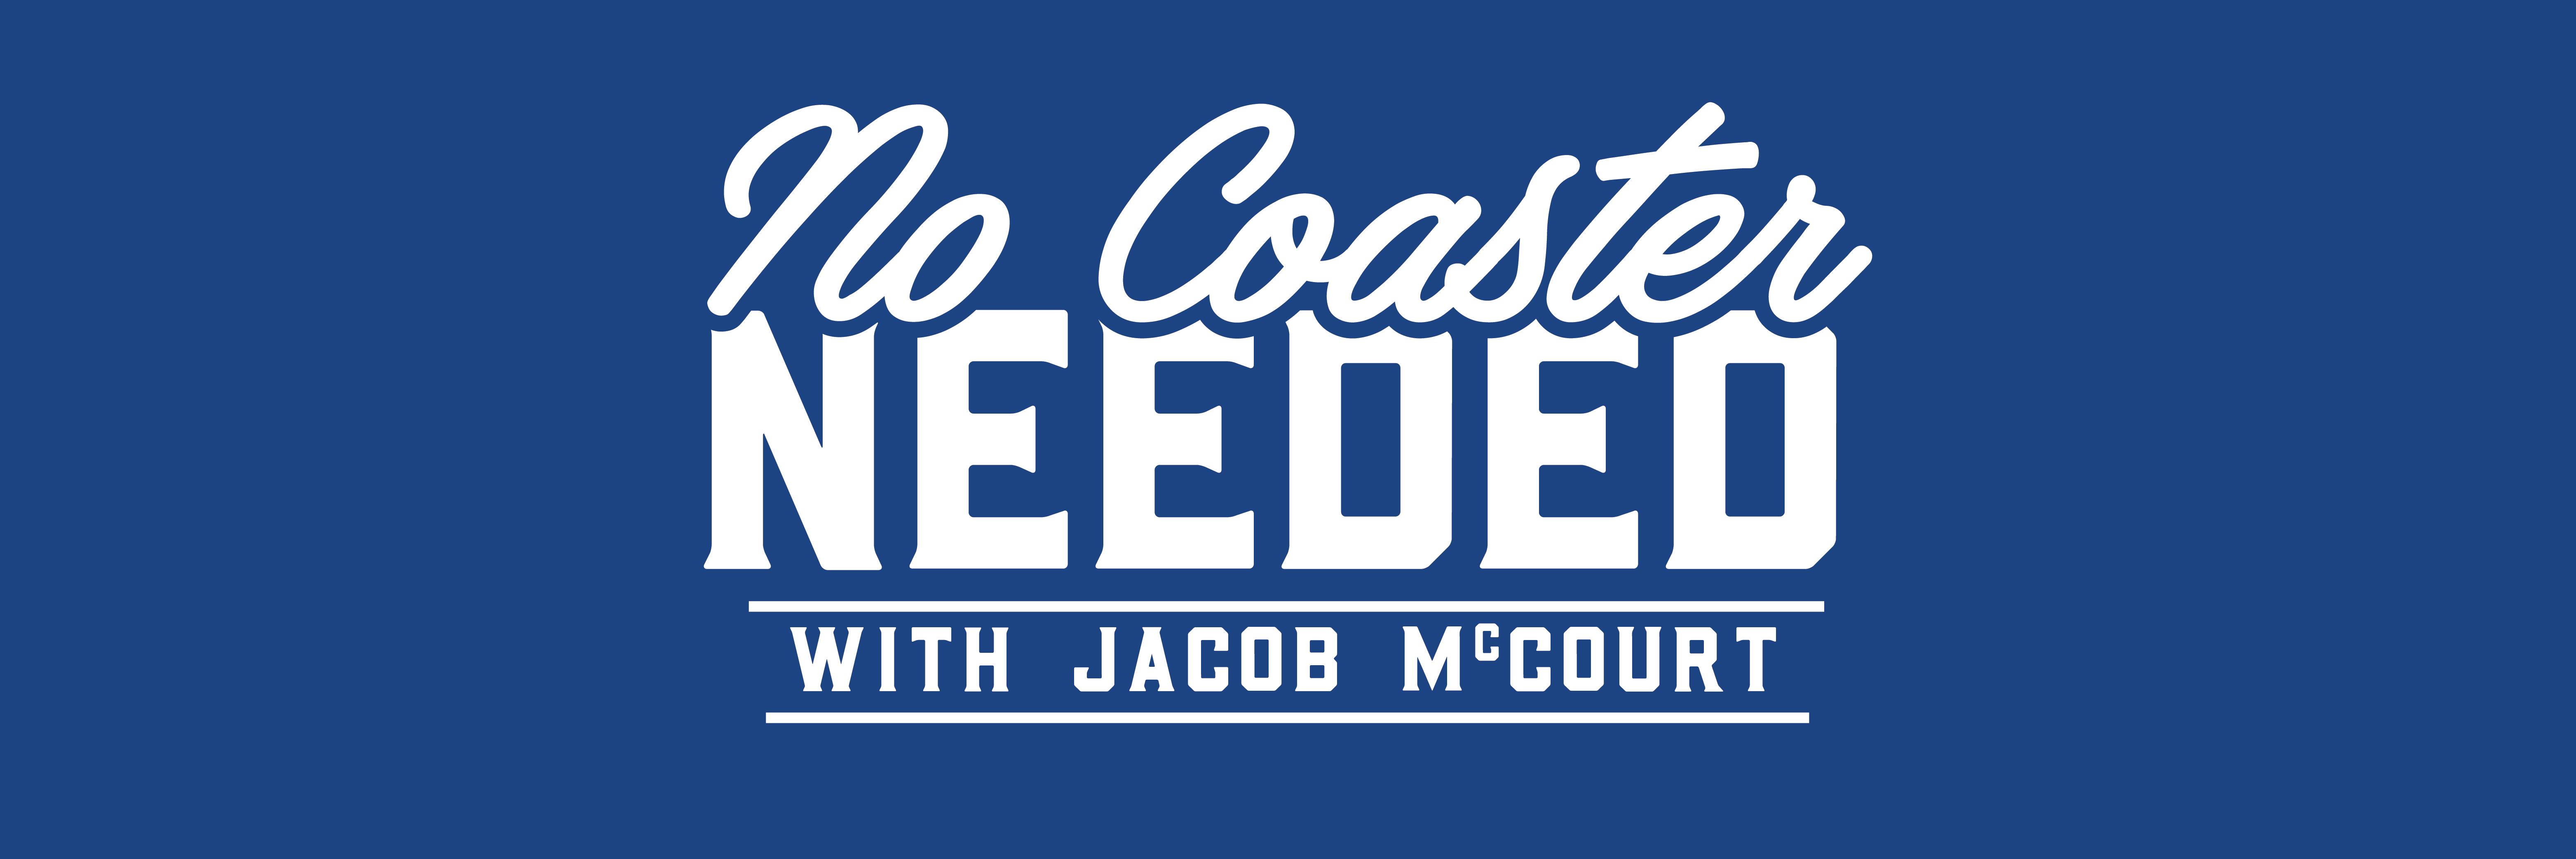 No Coaster Needed with Jacob McCourt